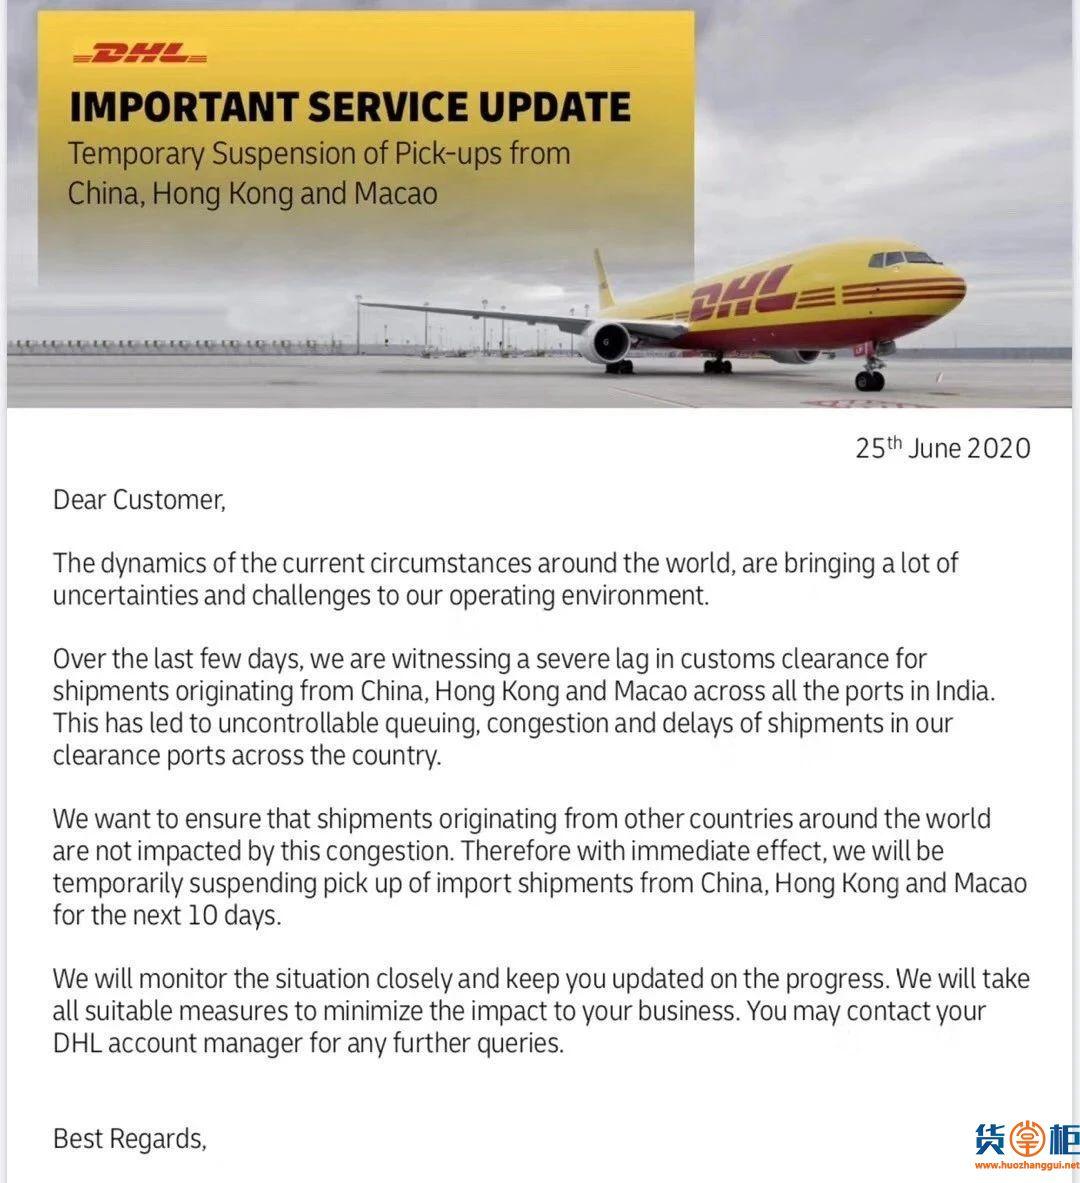 Fedex和DHL暂停收印度的货物